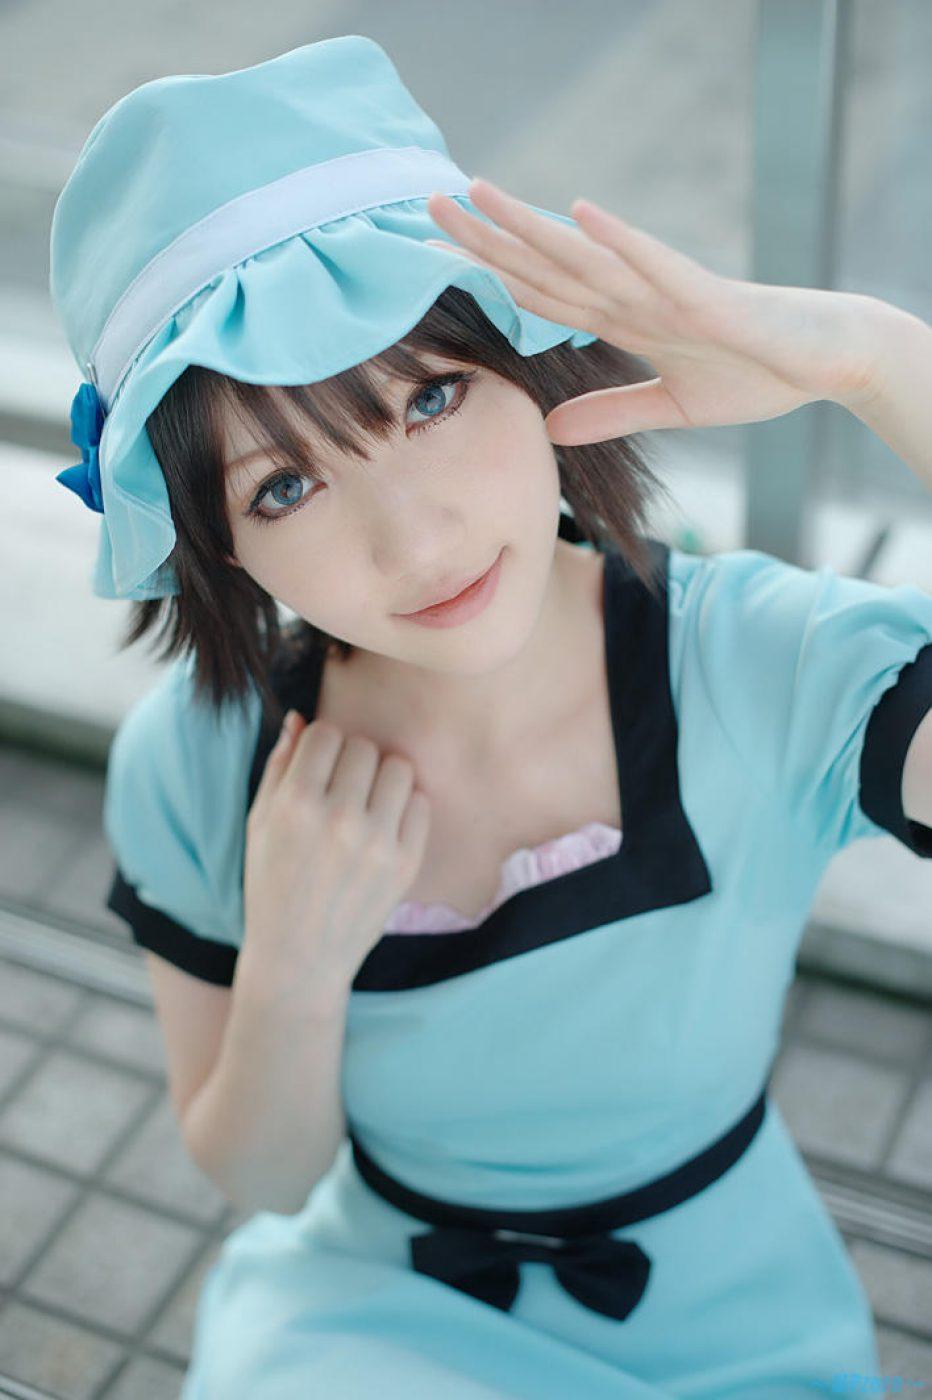 SteinsGate-Shiina-Mayuri-Cosplay-Gamers-Heroes-8.jpg